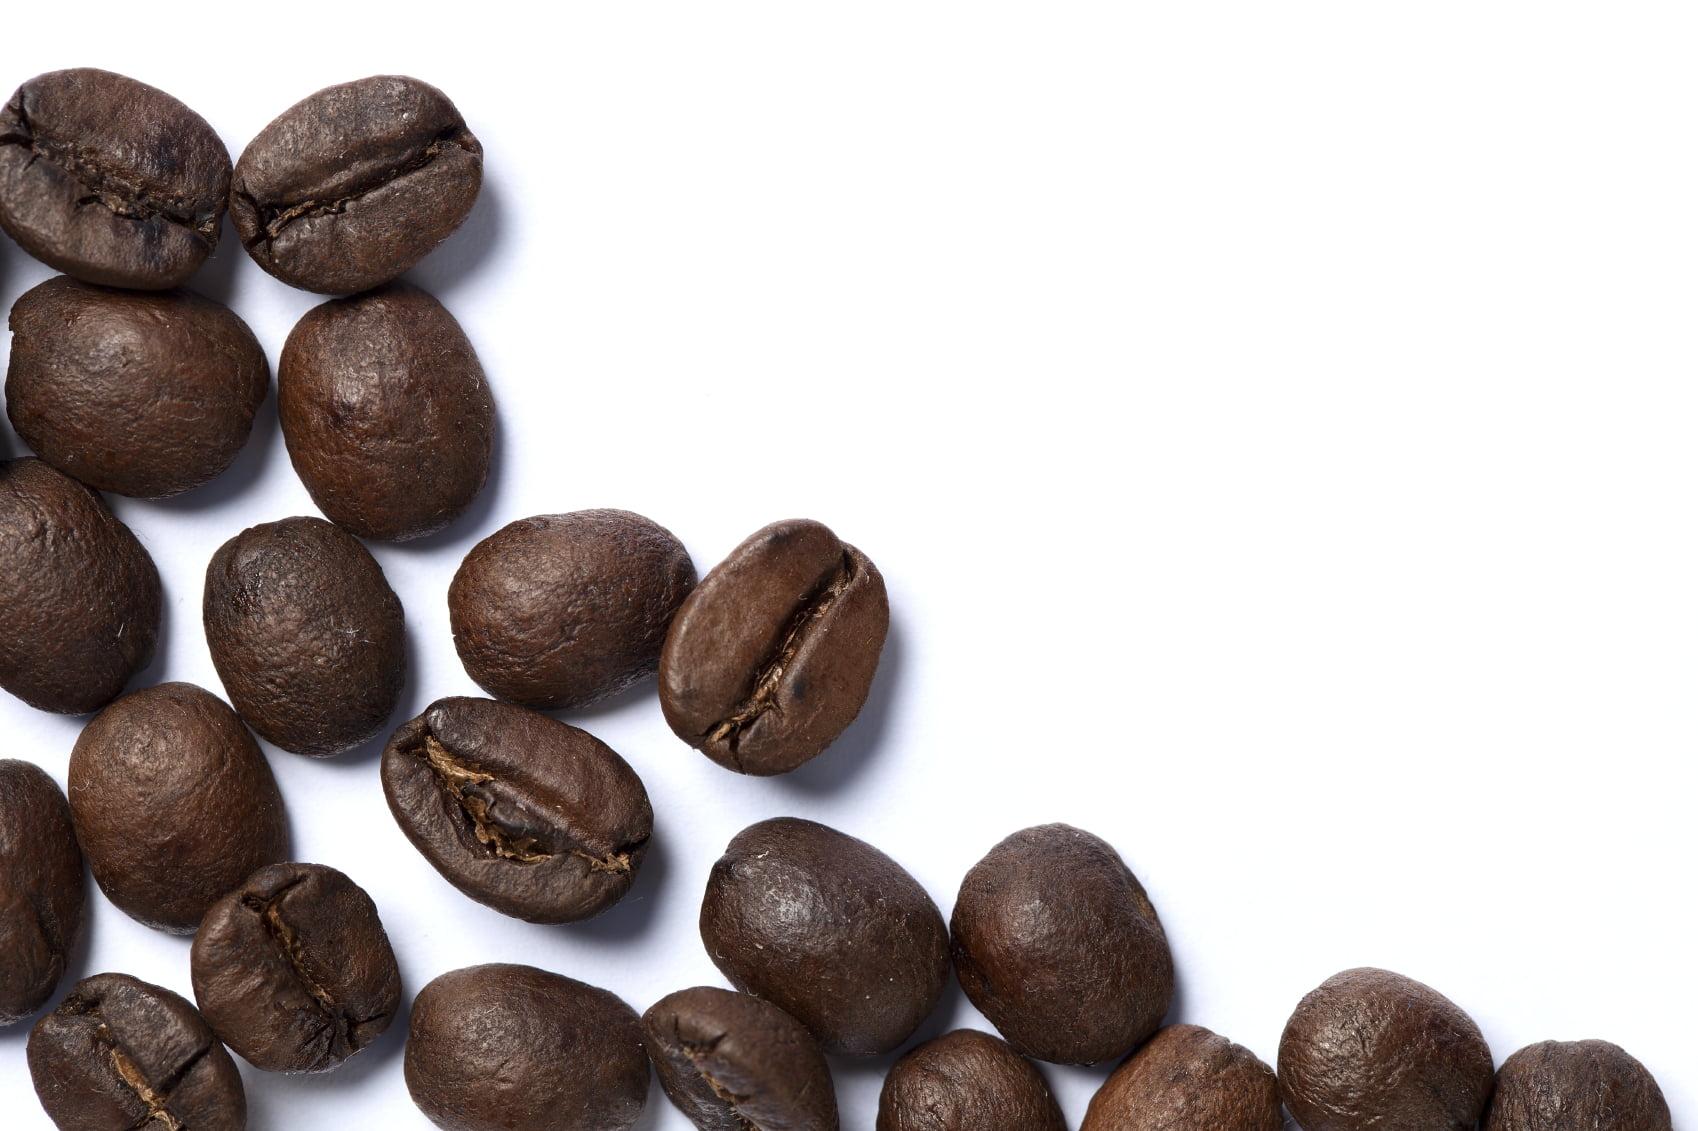 caffeine and health evidence from cochrane